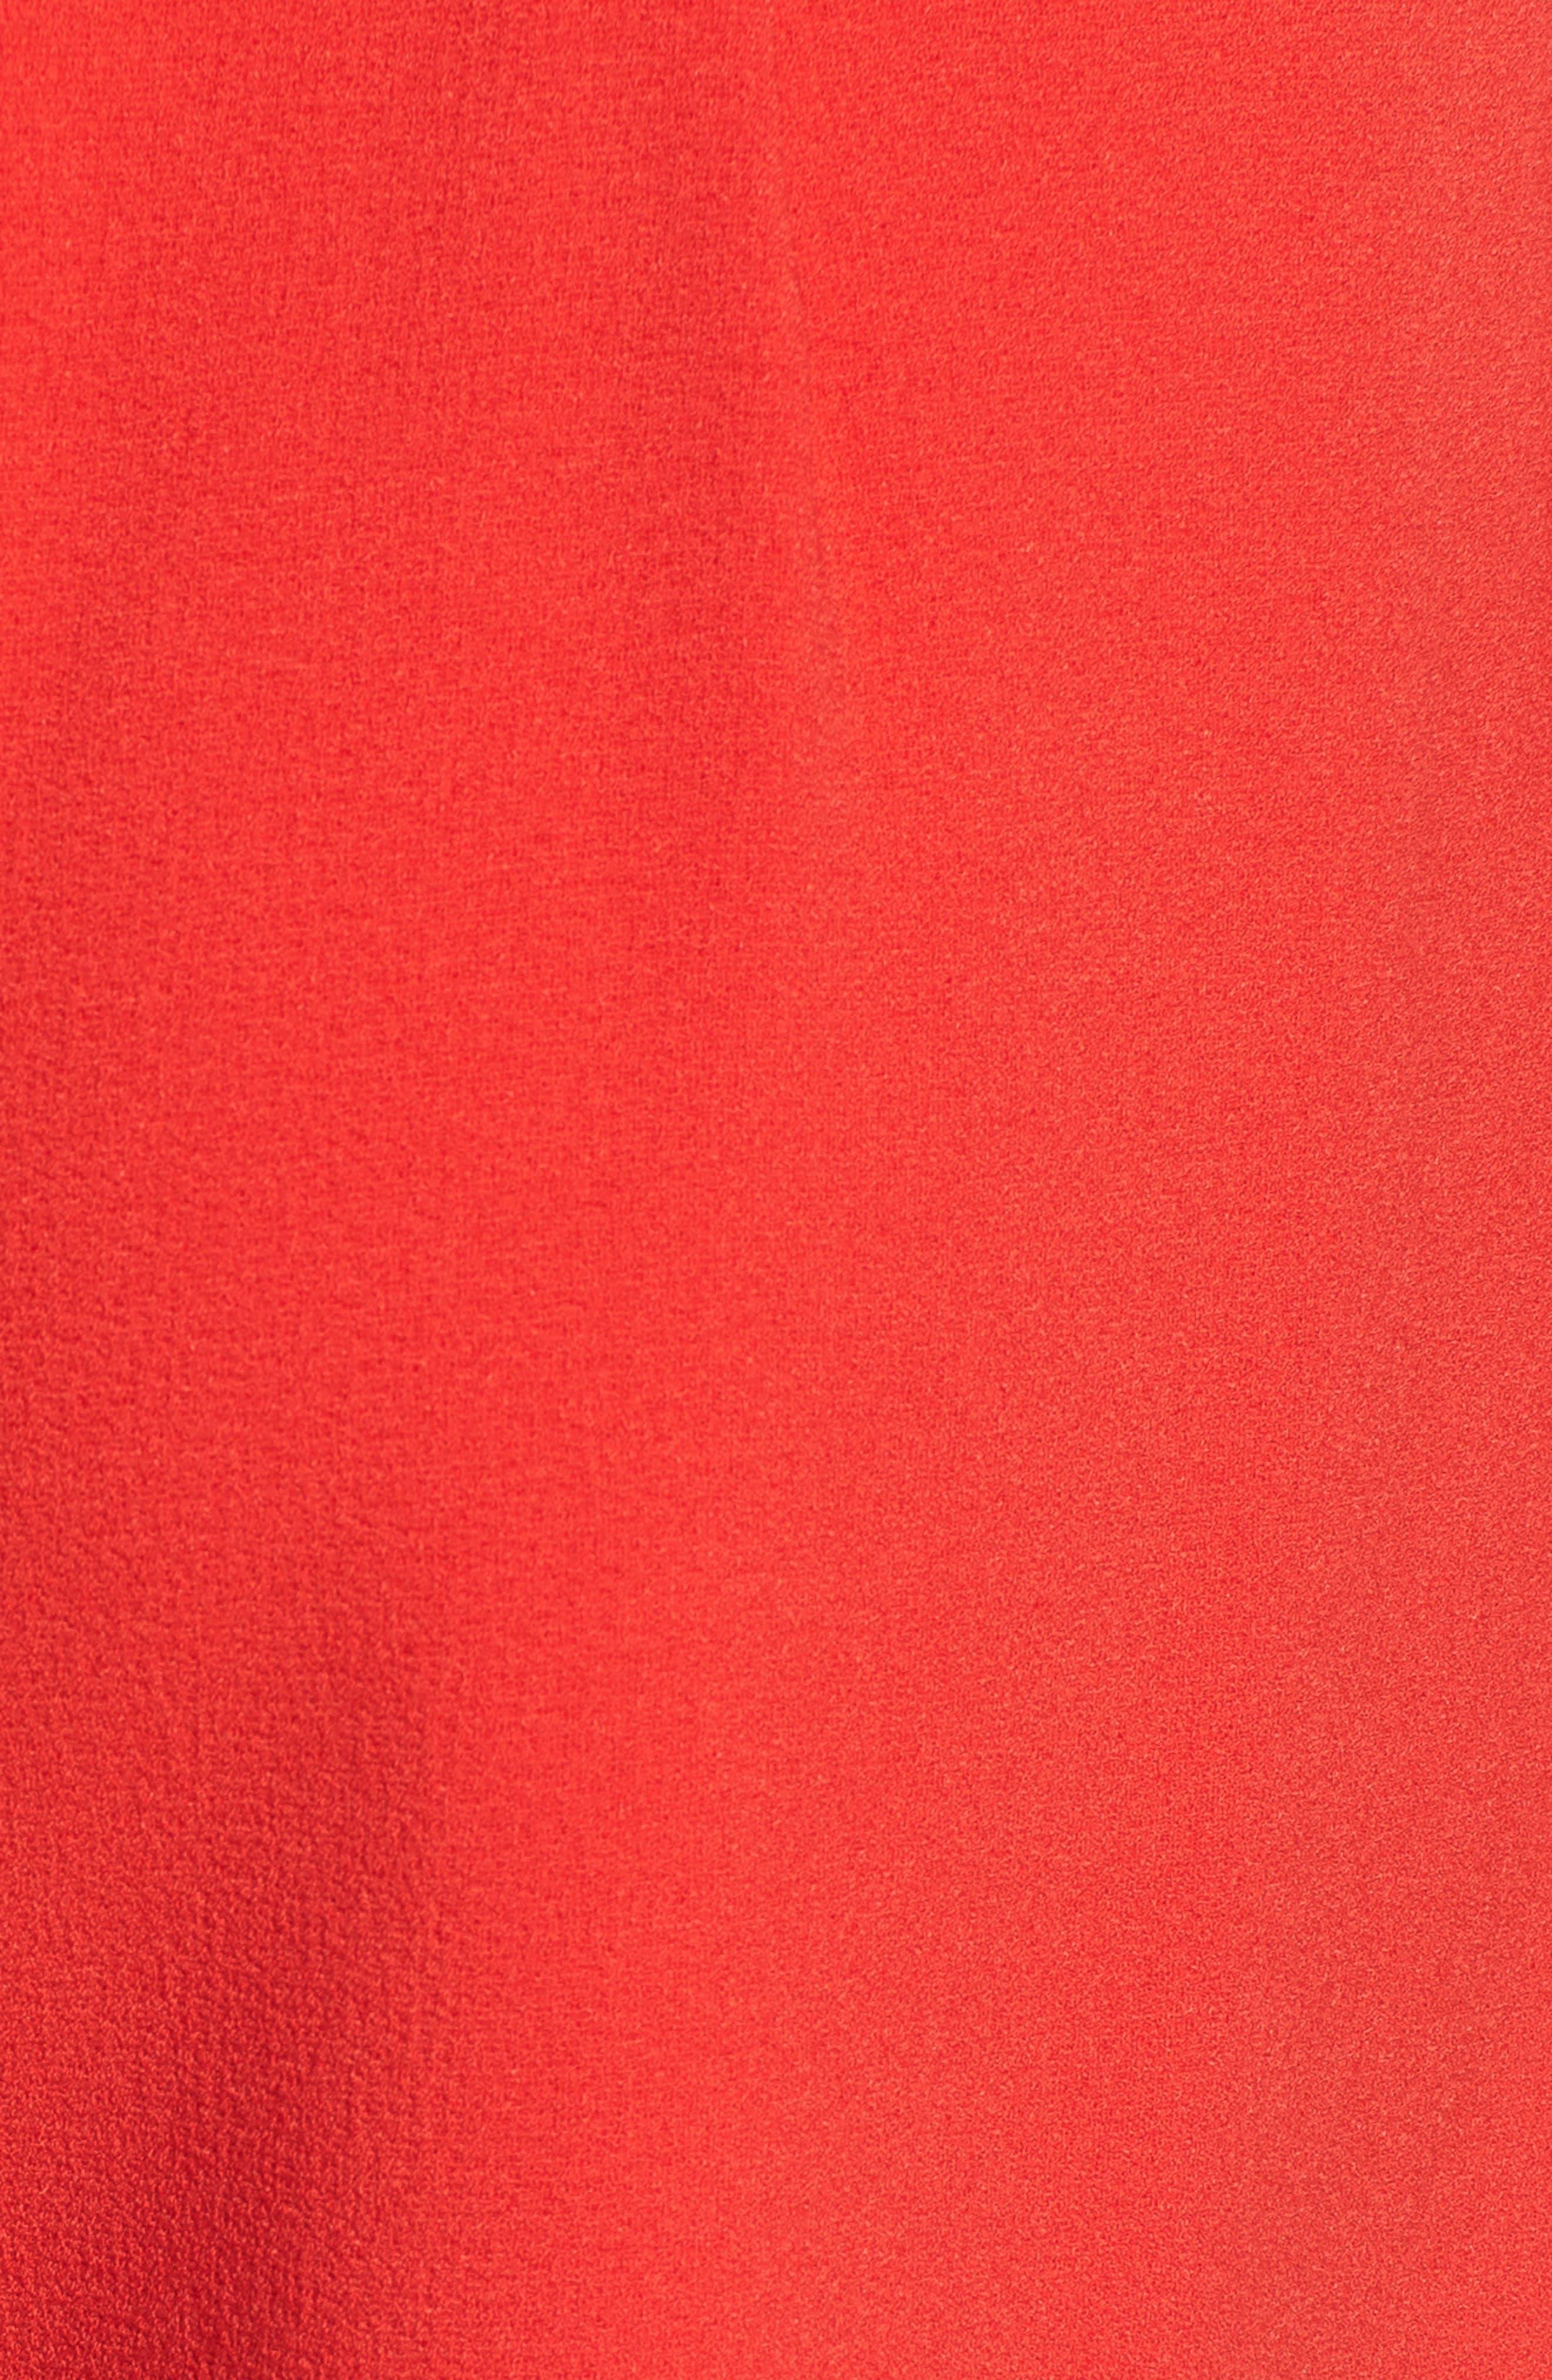 Tie Waist Shorts,                             Alternate thumbnail 5, color,                             RED LIPSTICK